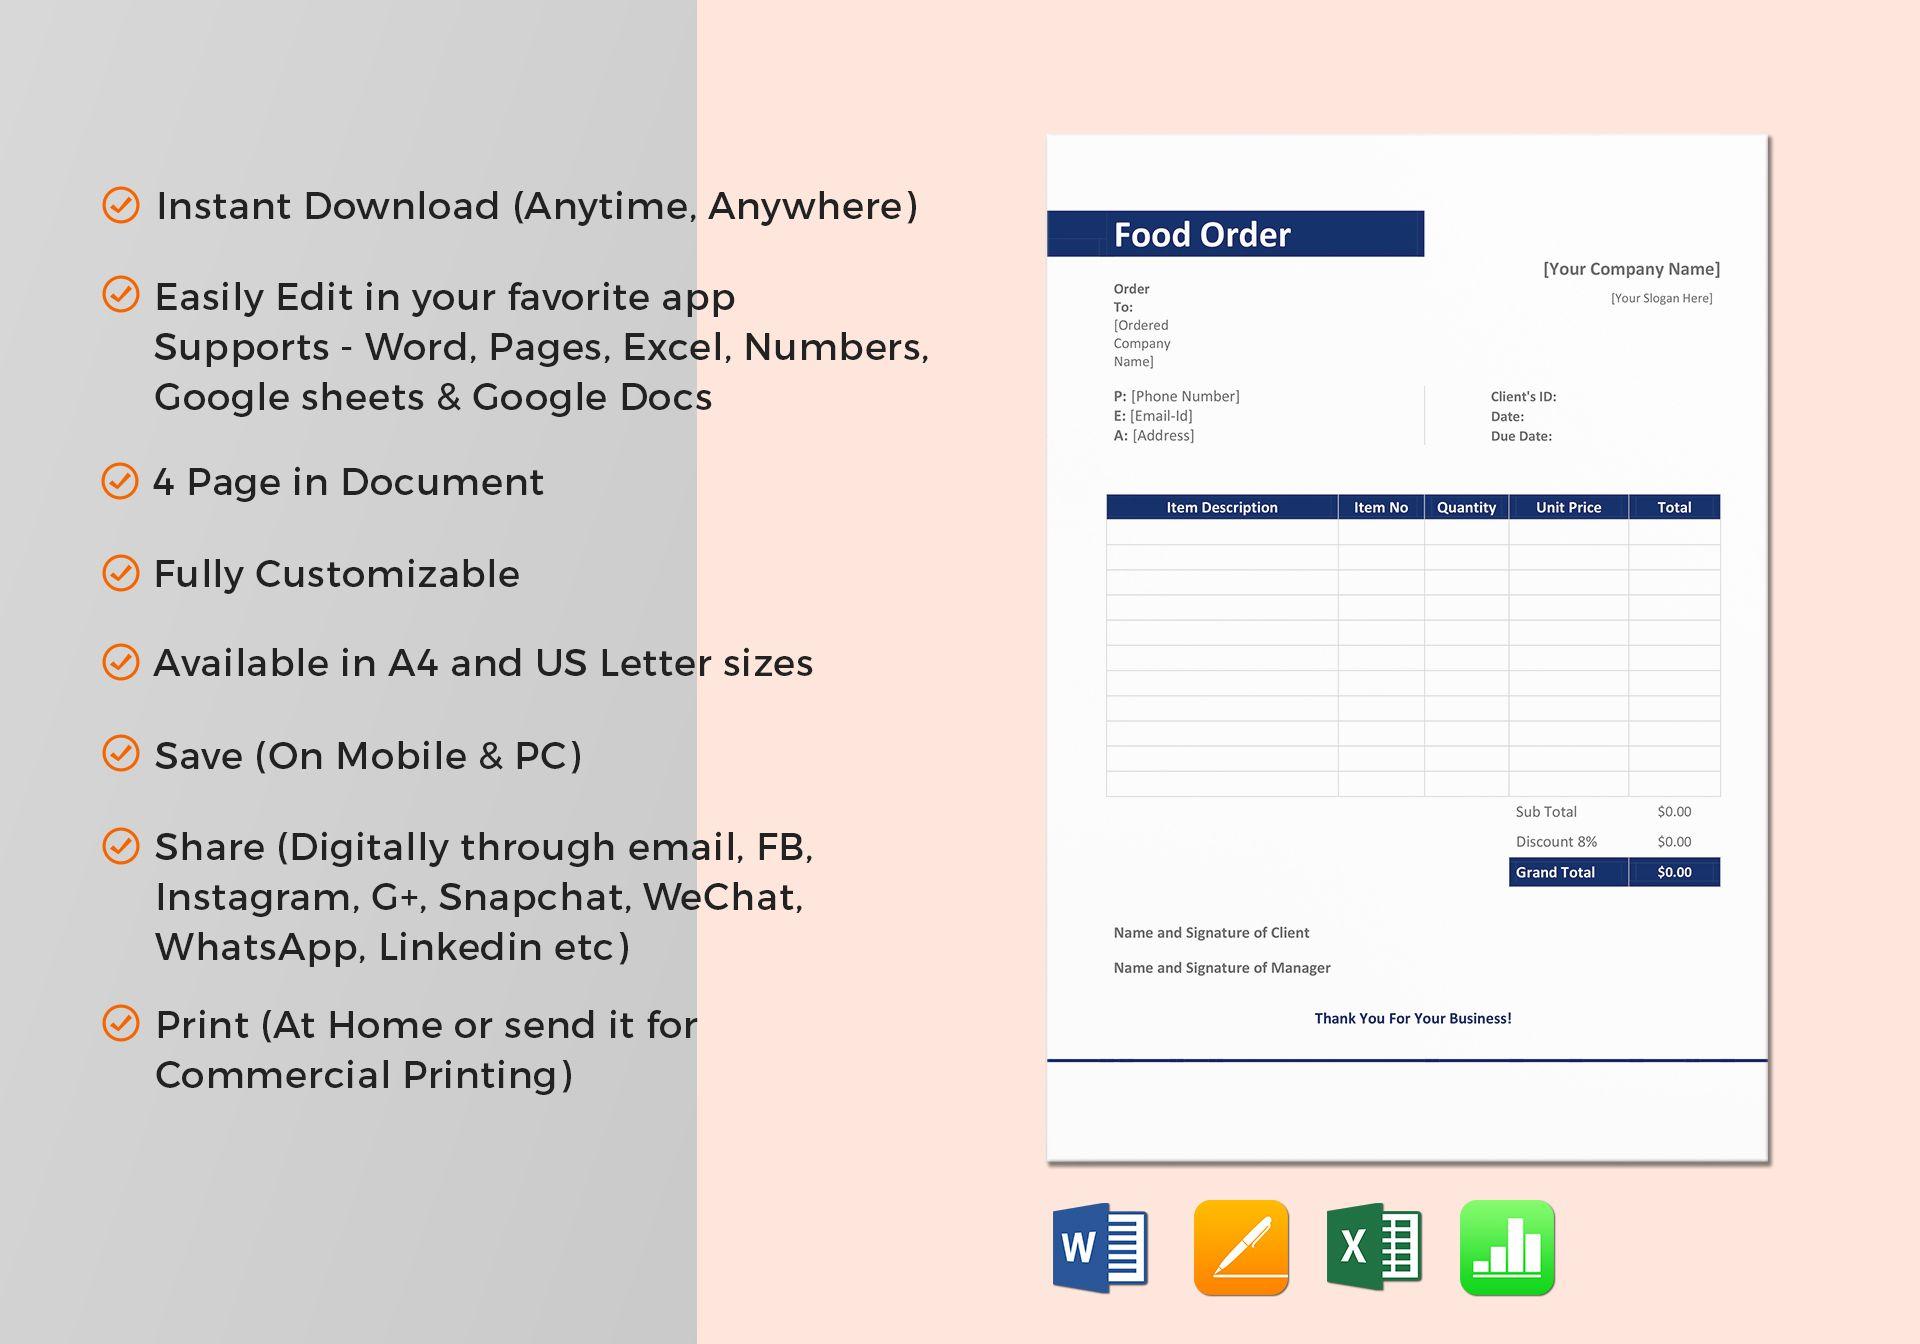 sample food order template